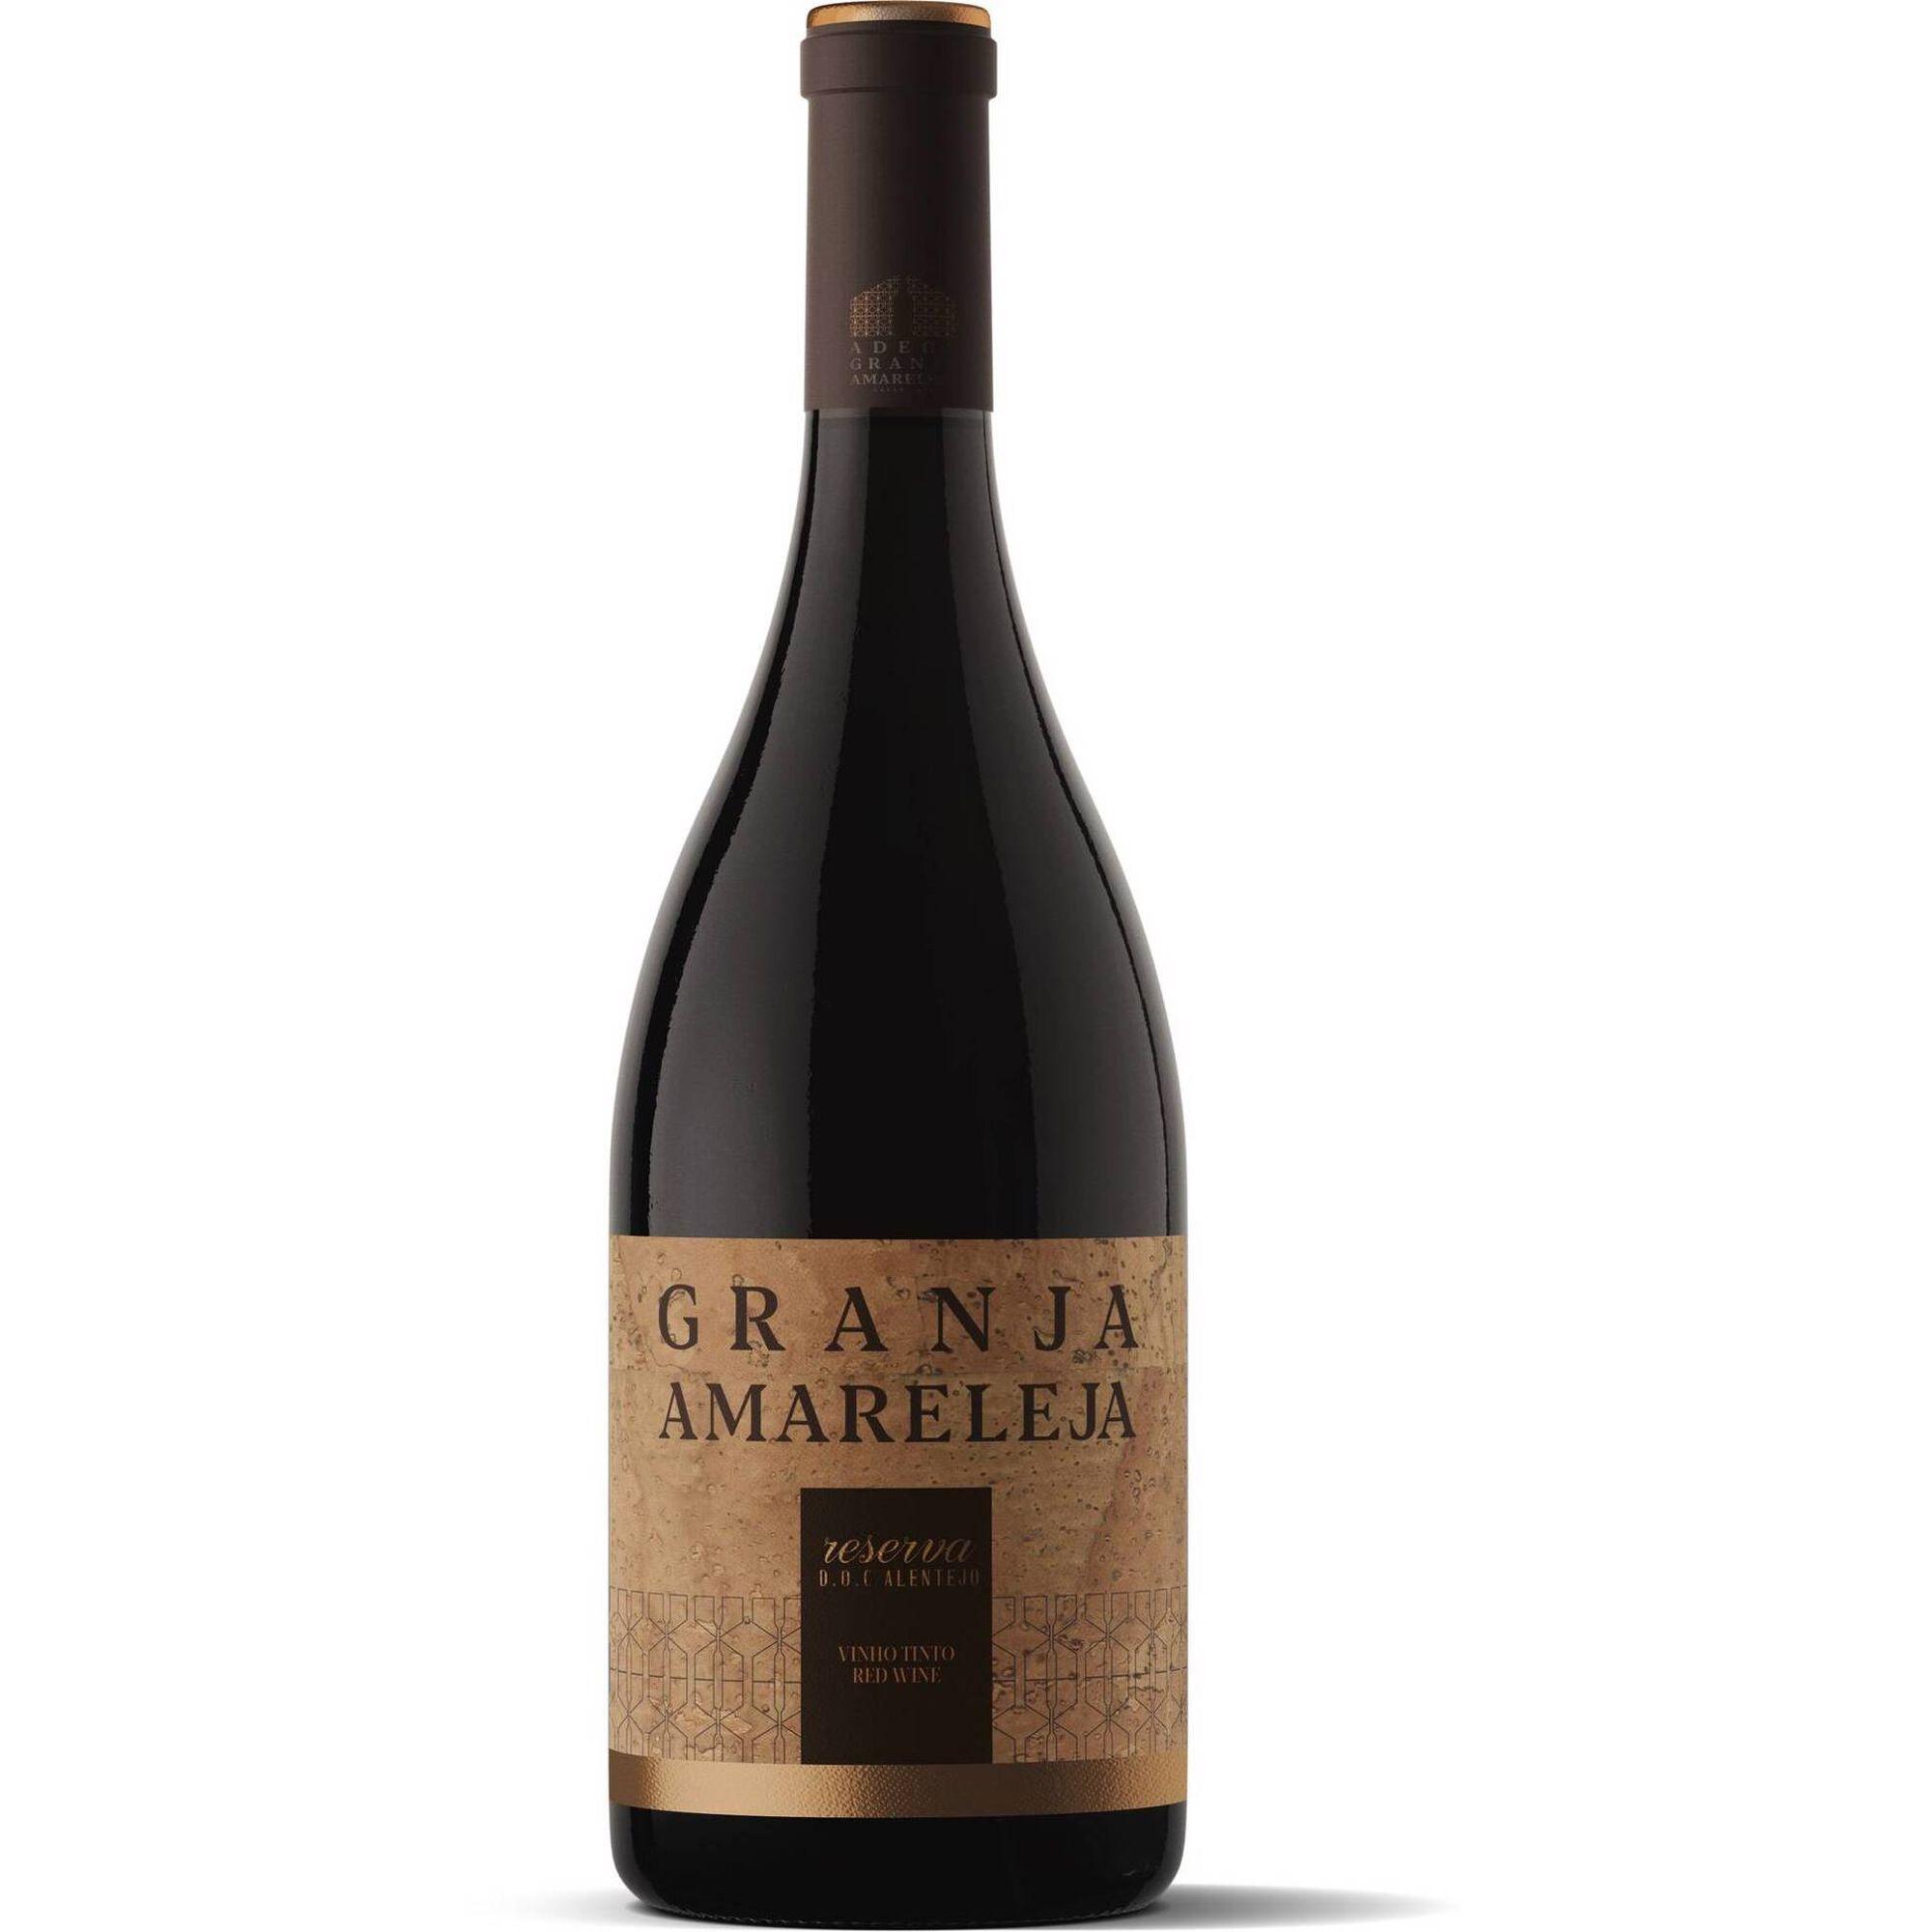 Granja Amareleja Reserva DOC Alentejo Vinho Tinto